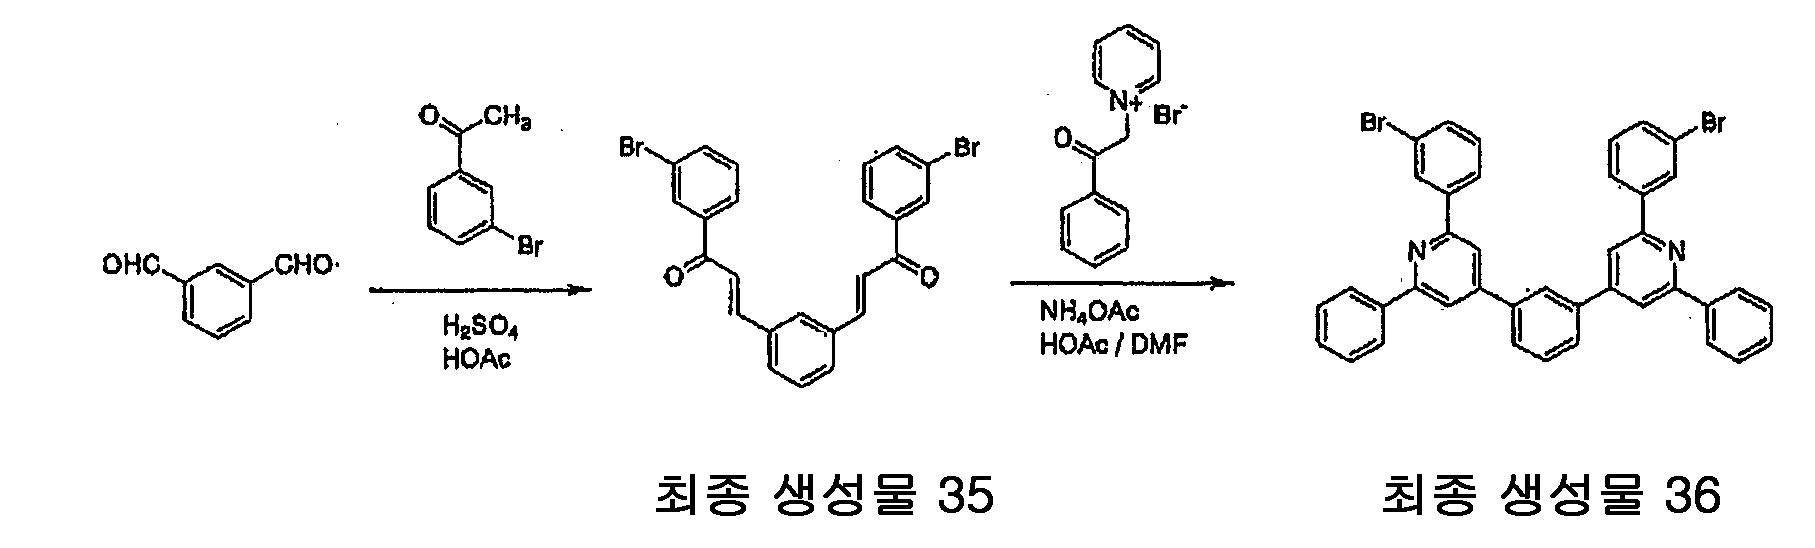 Figure 112010002231902-pat00127